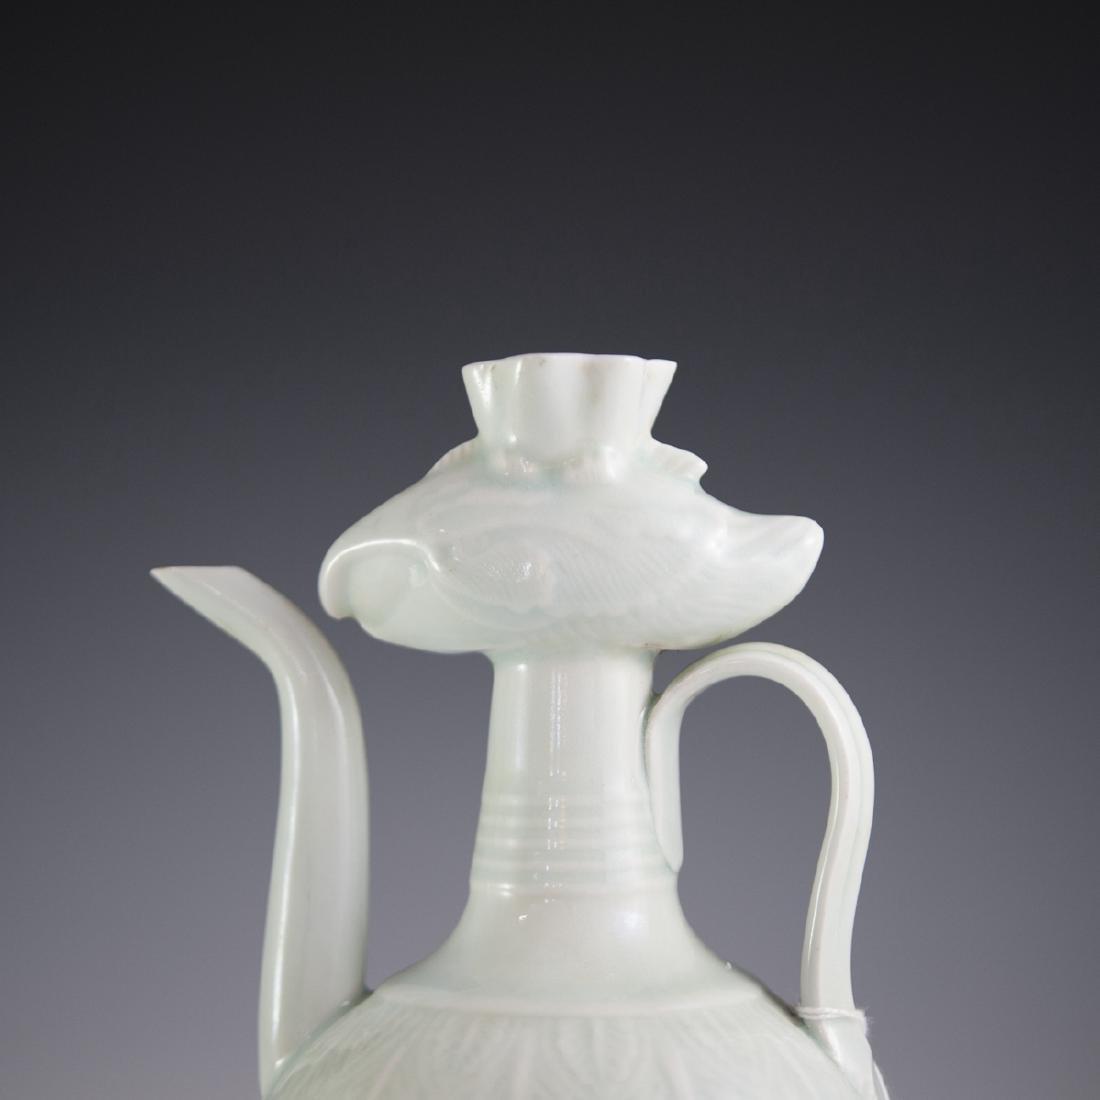 Antique Chinese Celadon Glazed Ewer - 2